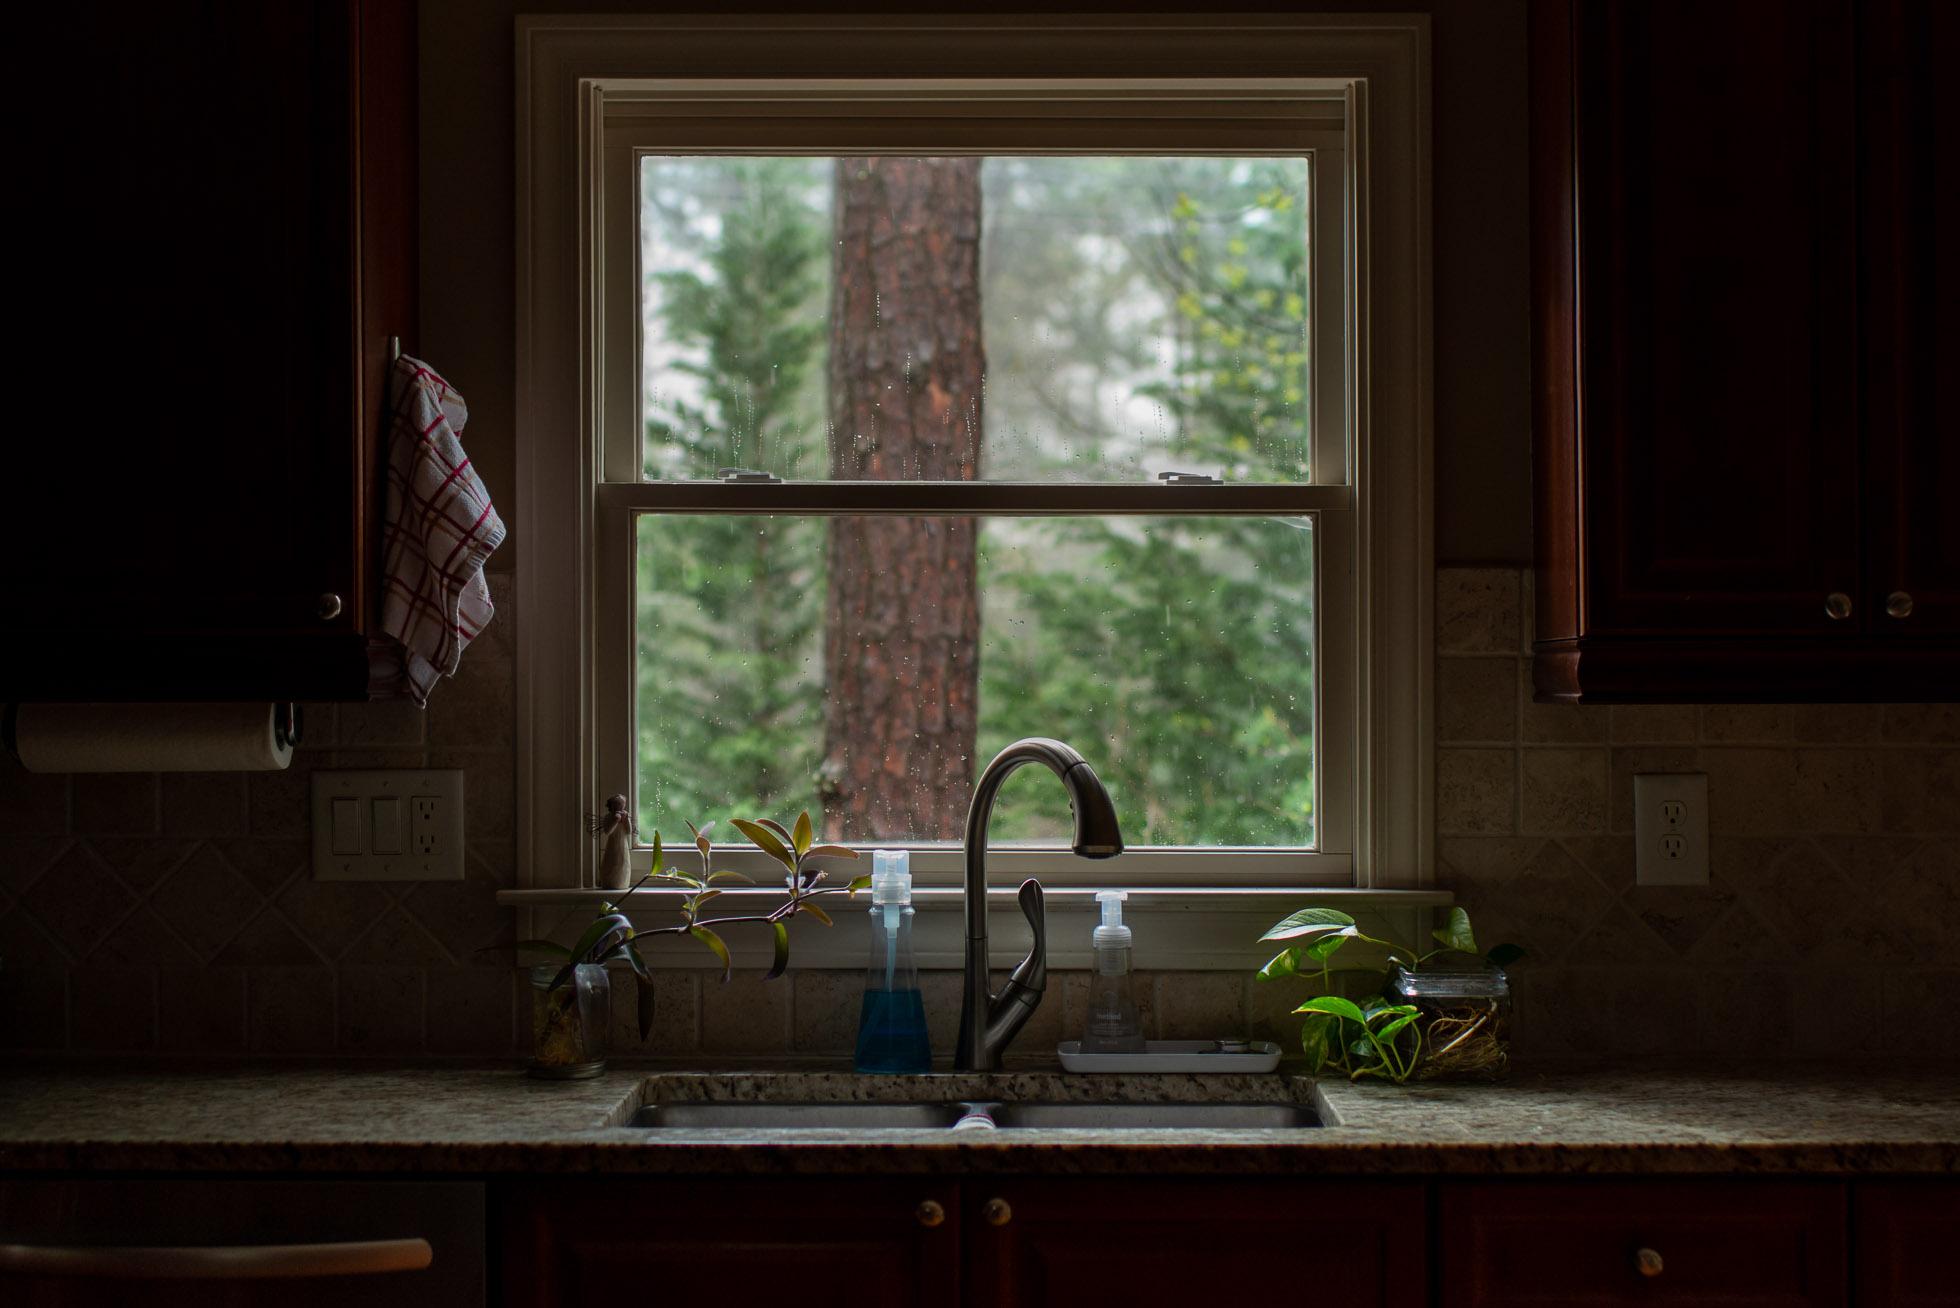 moody kitchen sink window on a rainy morning